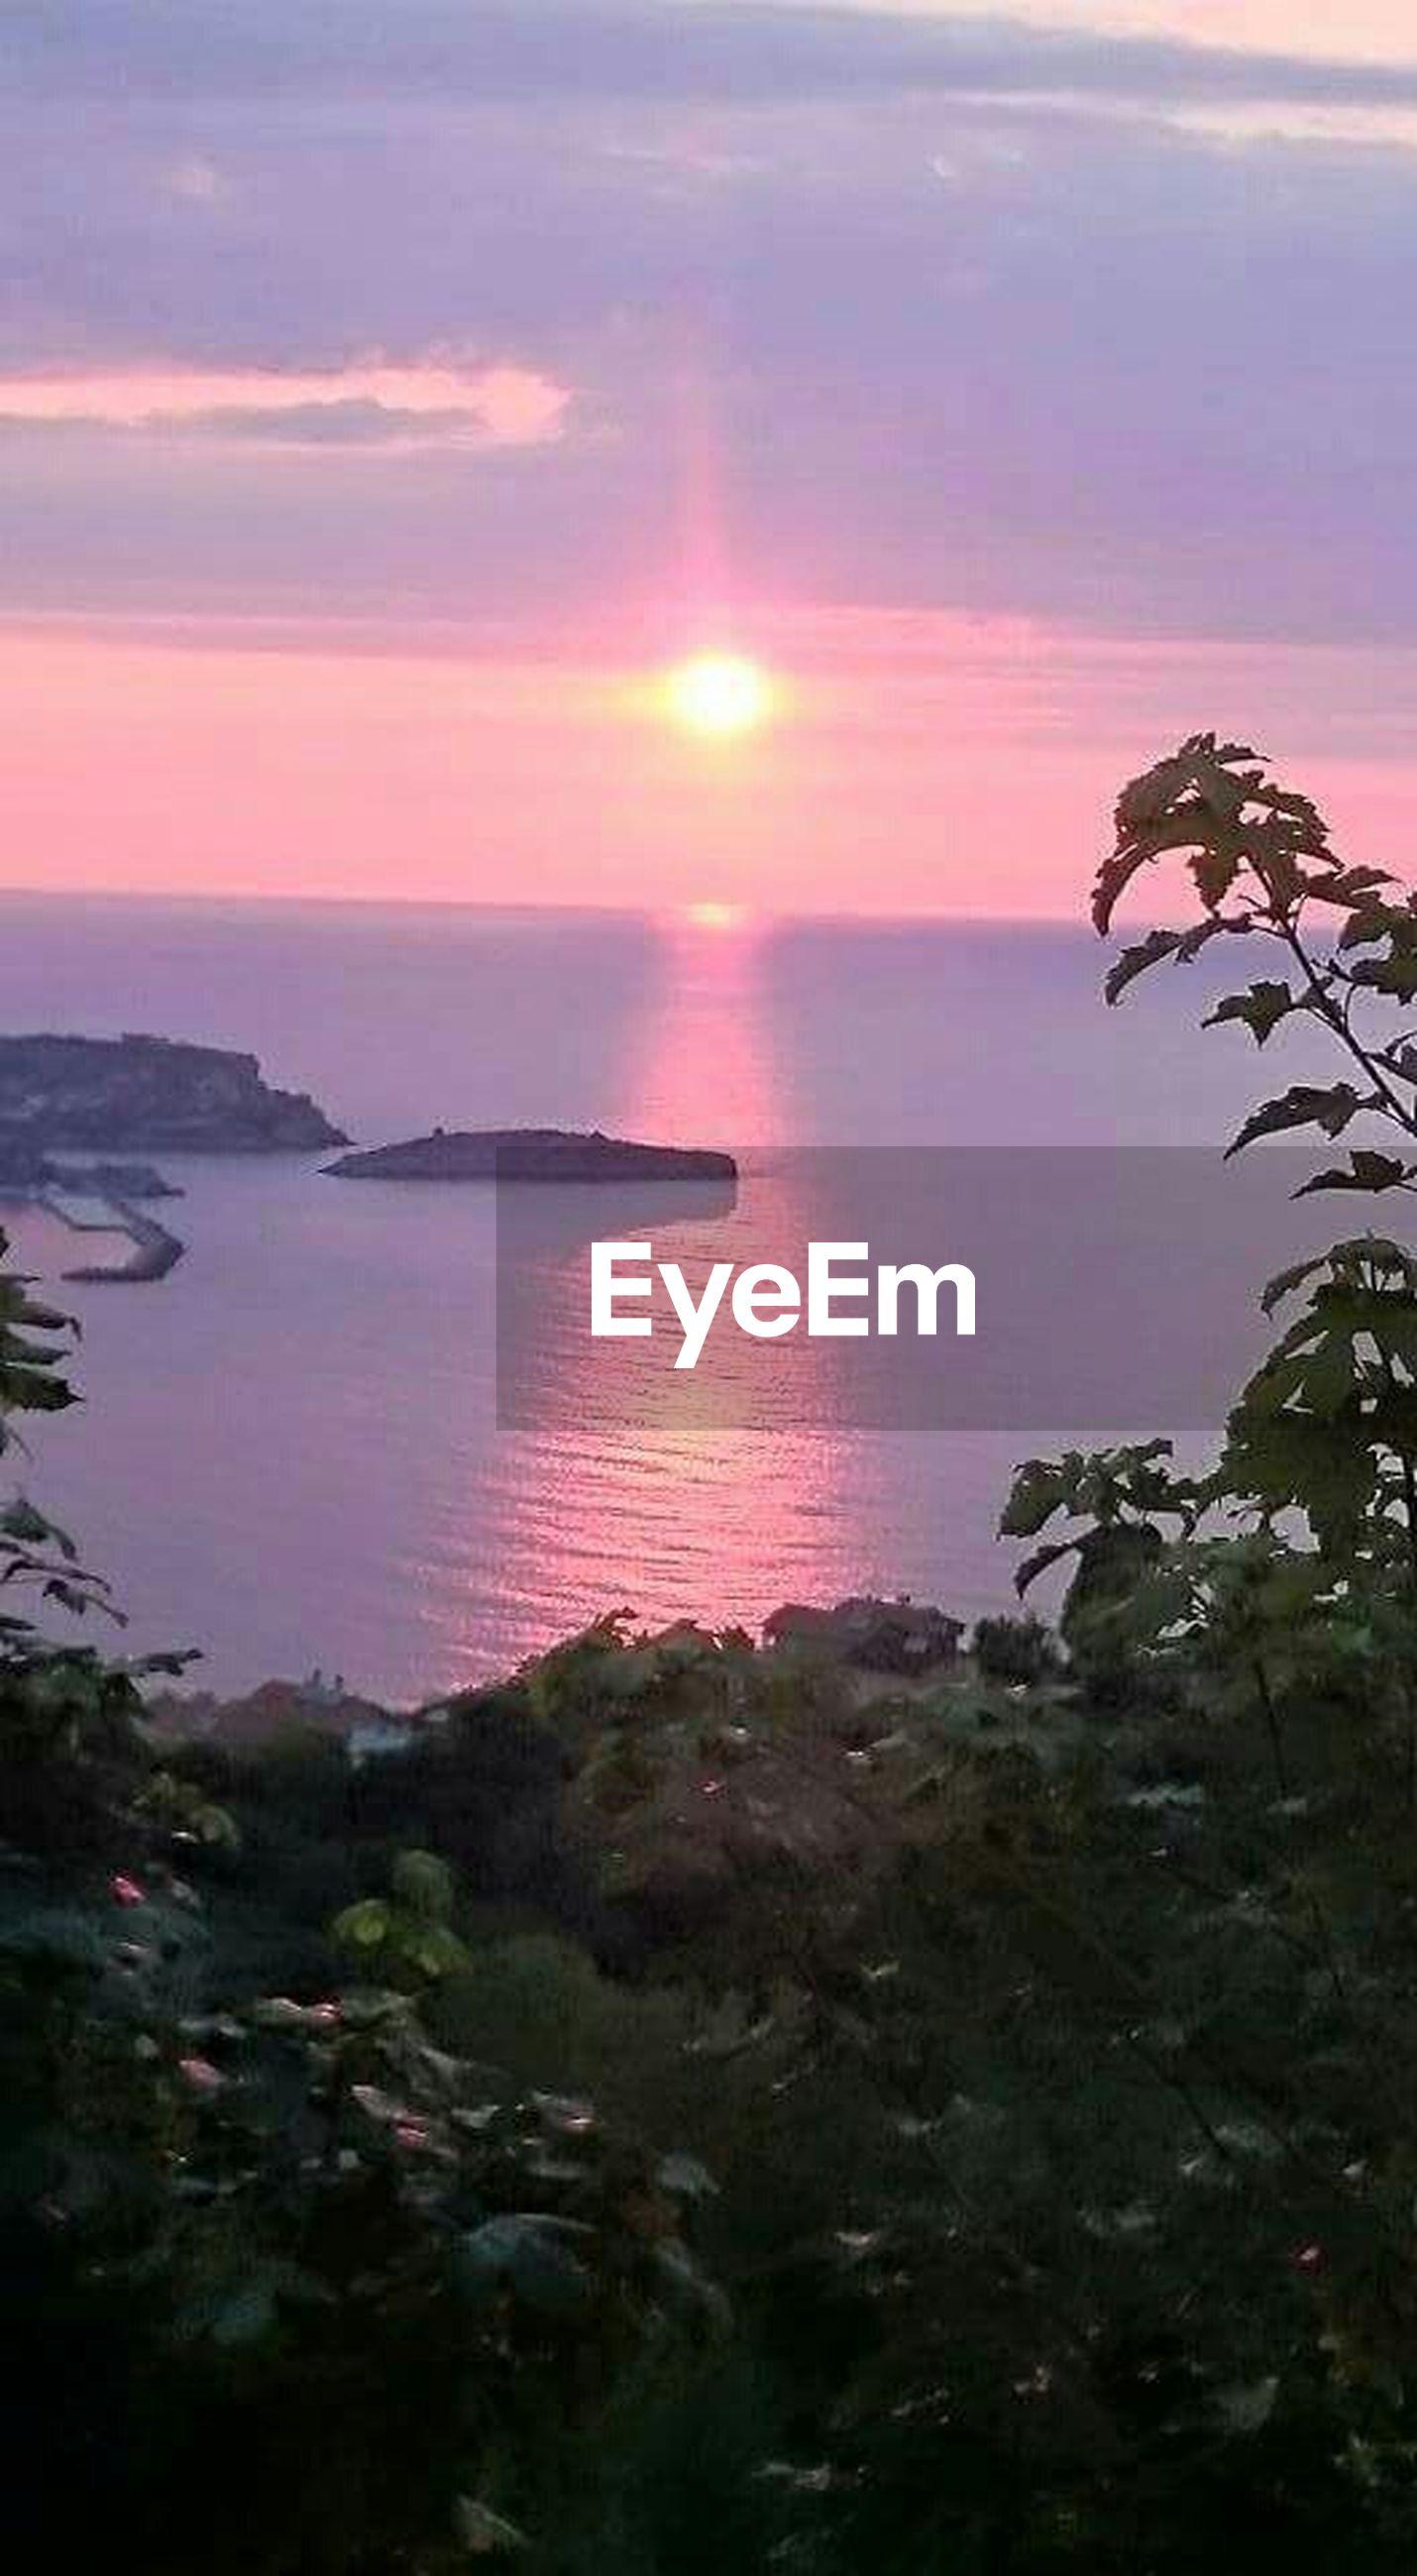 sea, horizon over water, sunset, water, scenics, tranquil scene, beauty in nature, tranquility, sun, sky, orange color, nature, idyllic, beach, reflection, sunlight, tree, seascape, shore, cloud - sky